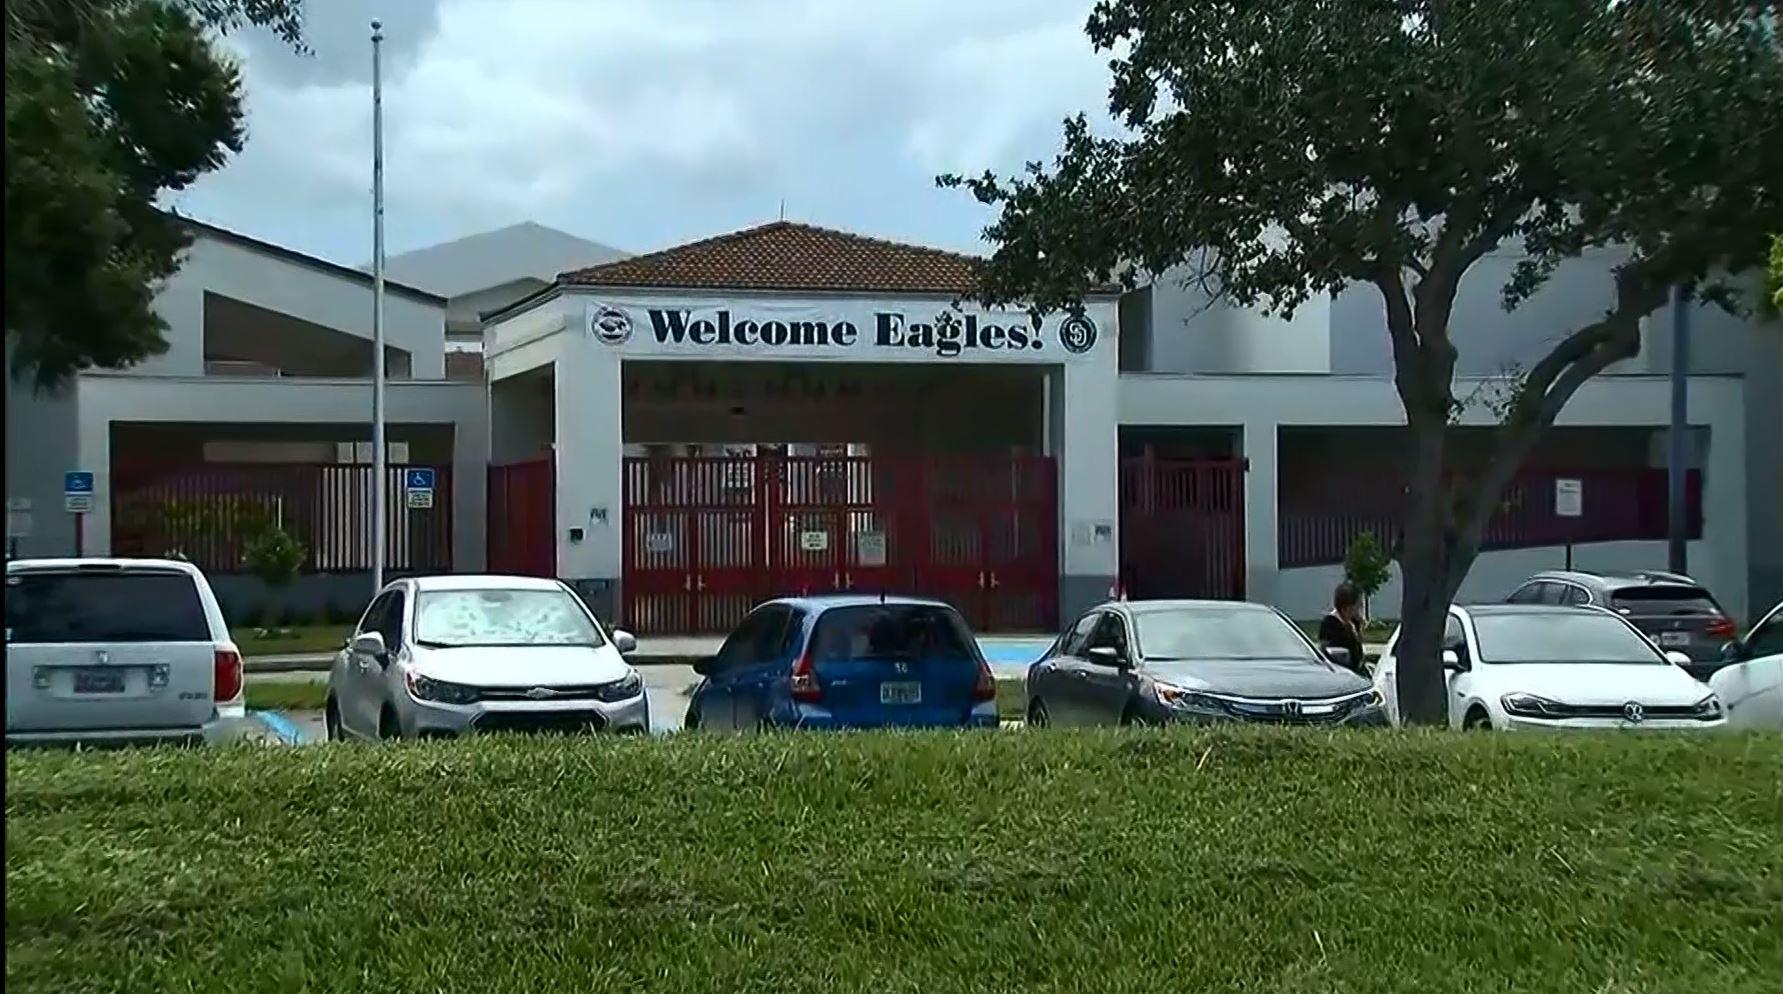 Students return to Stoneman Douglas High School for new school year